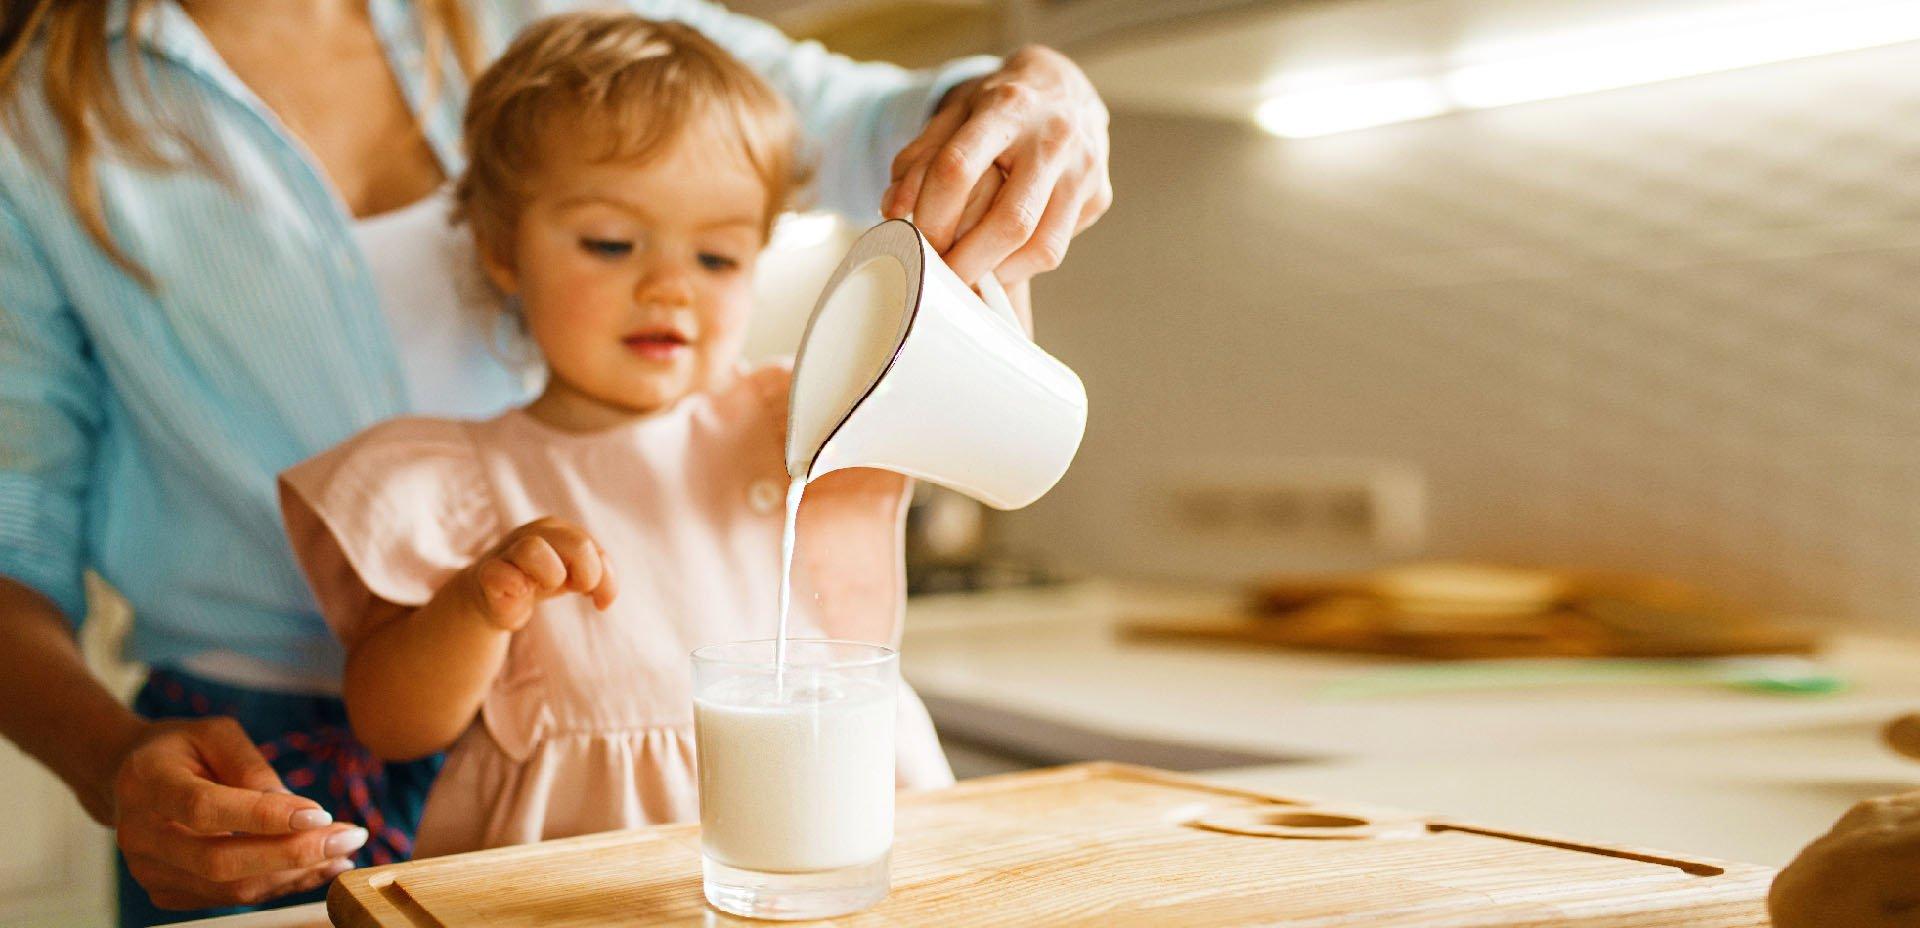 Latte vaccino e bambini